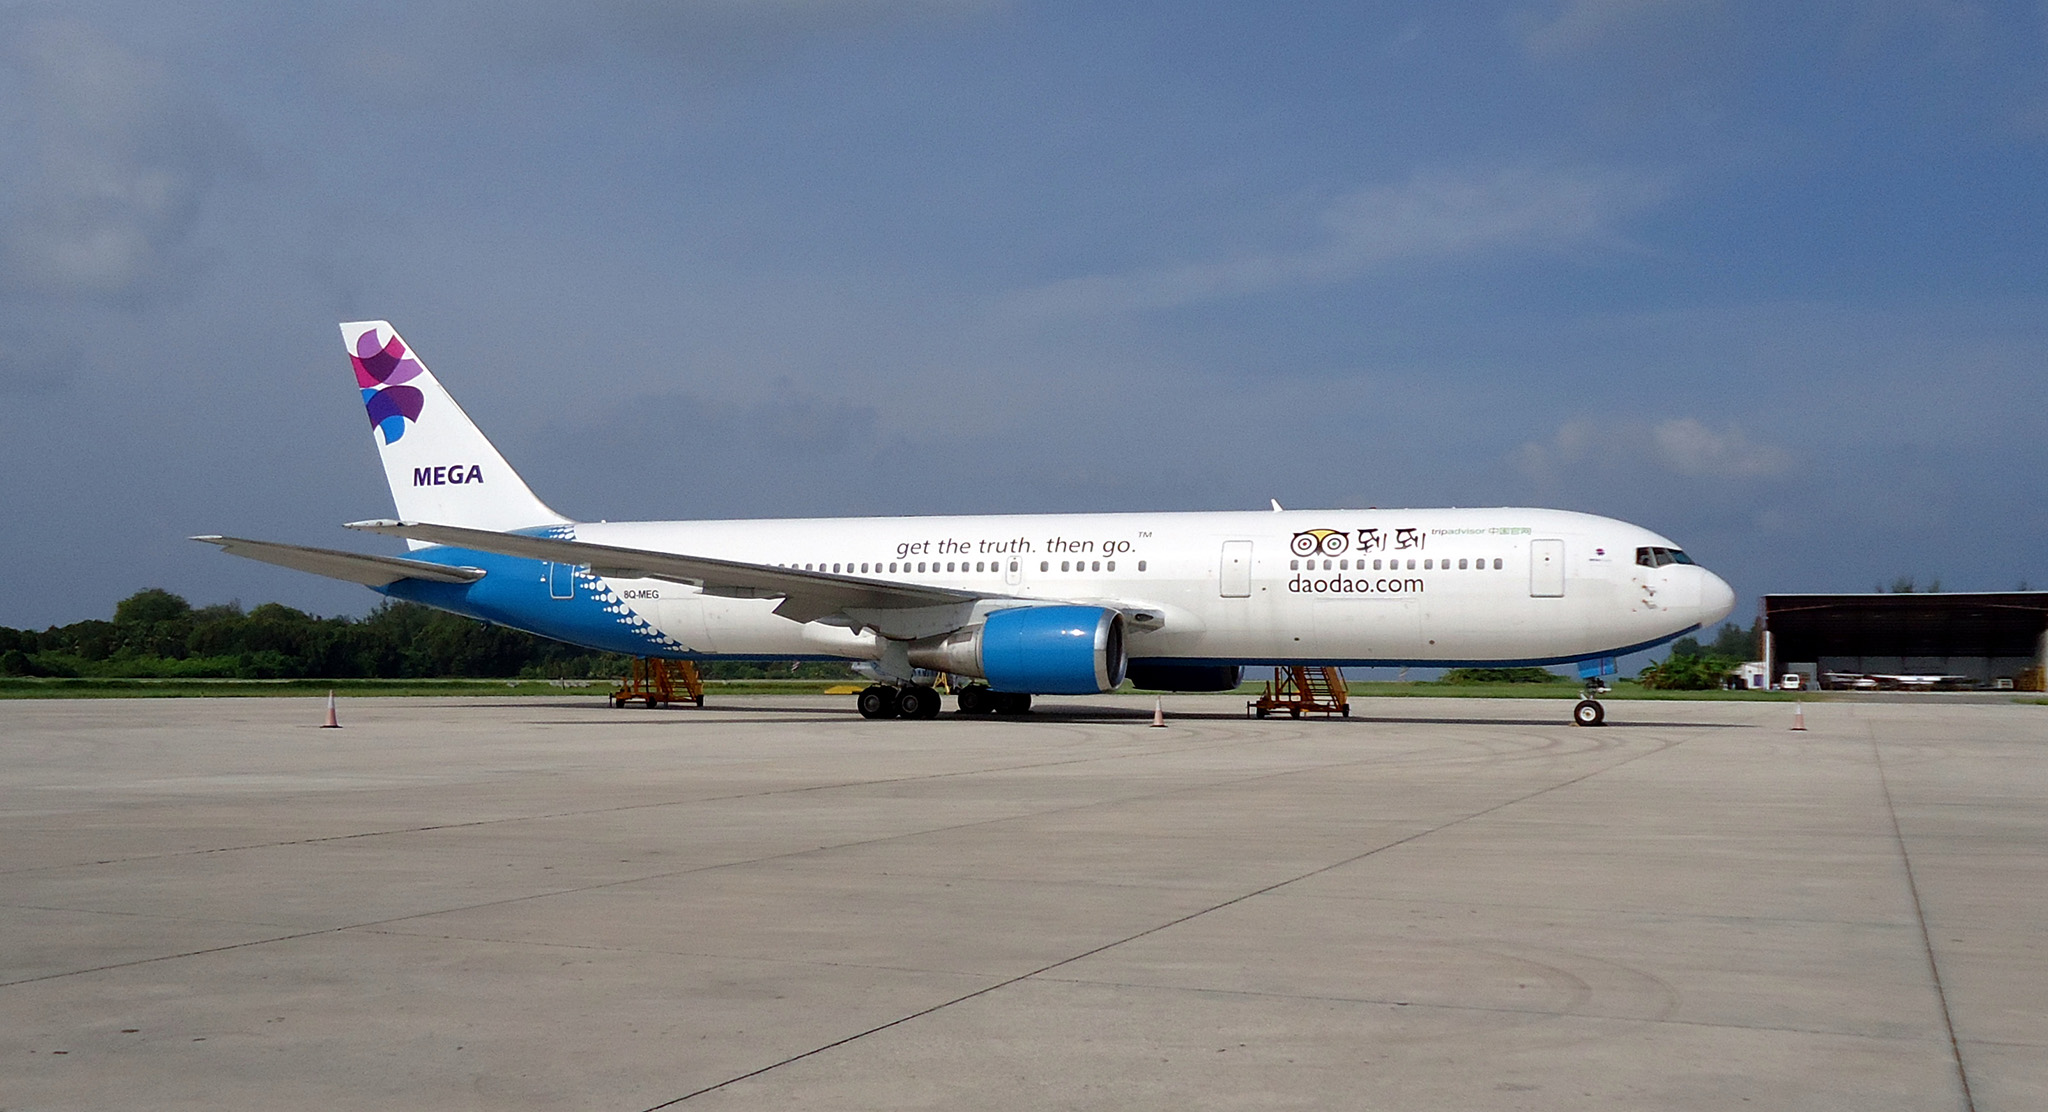 Boeing 767-300 de MEGA.